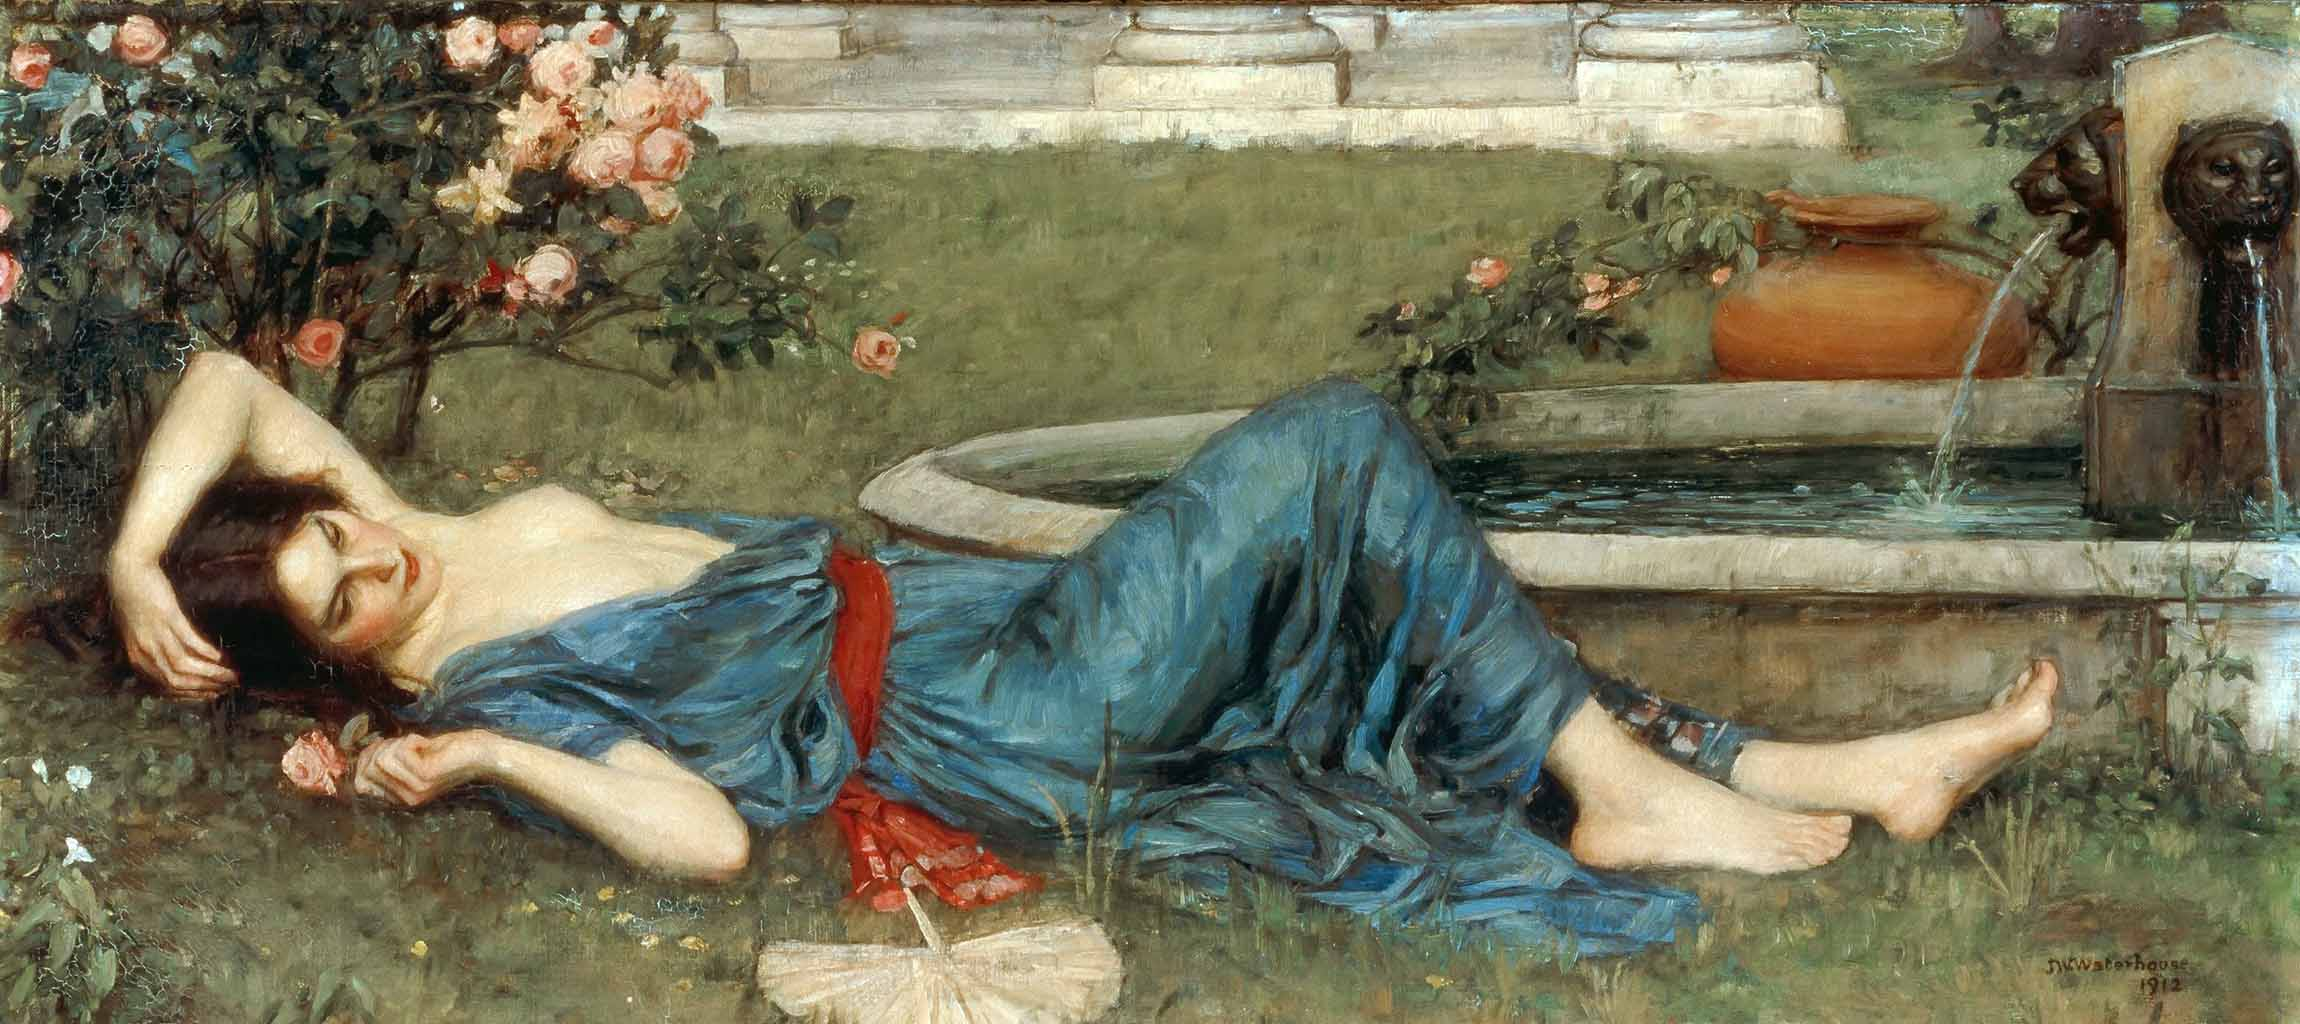 "Джон Уильям Уотерхаус (John William Waterhouse), ""Ласковое лето"""